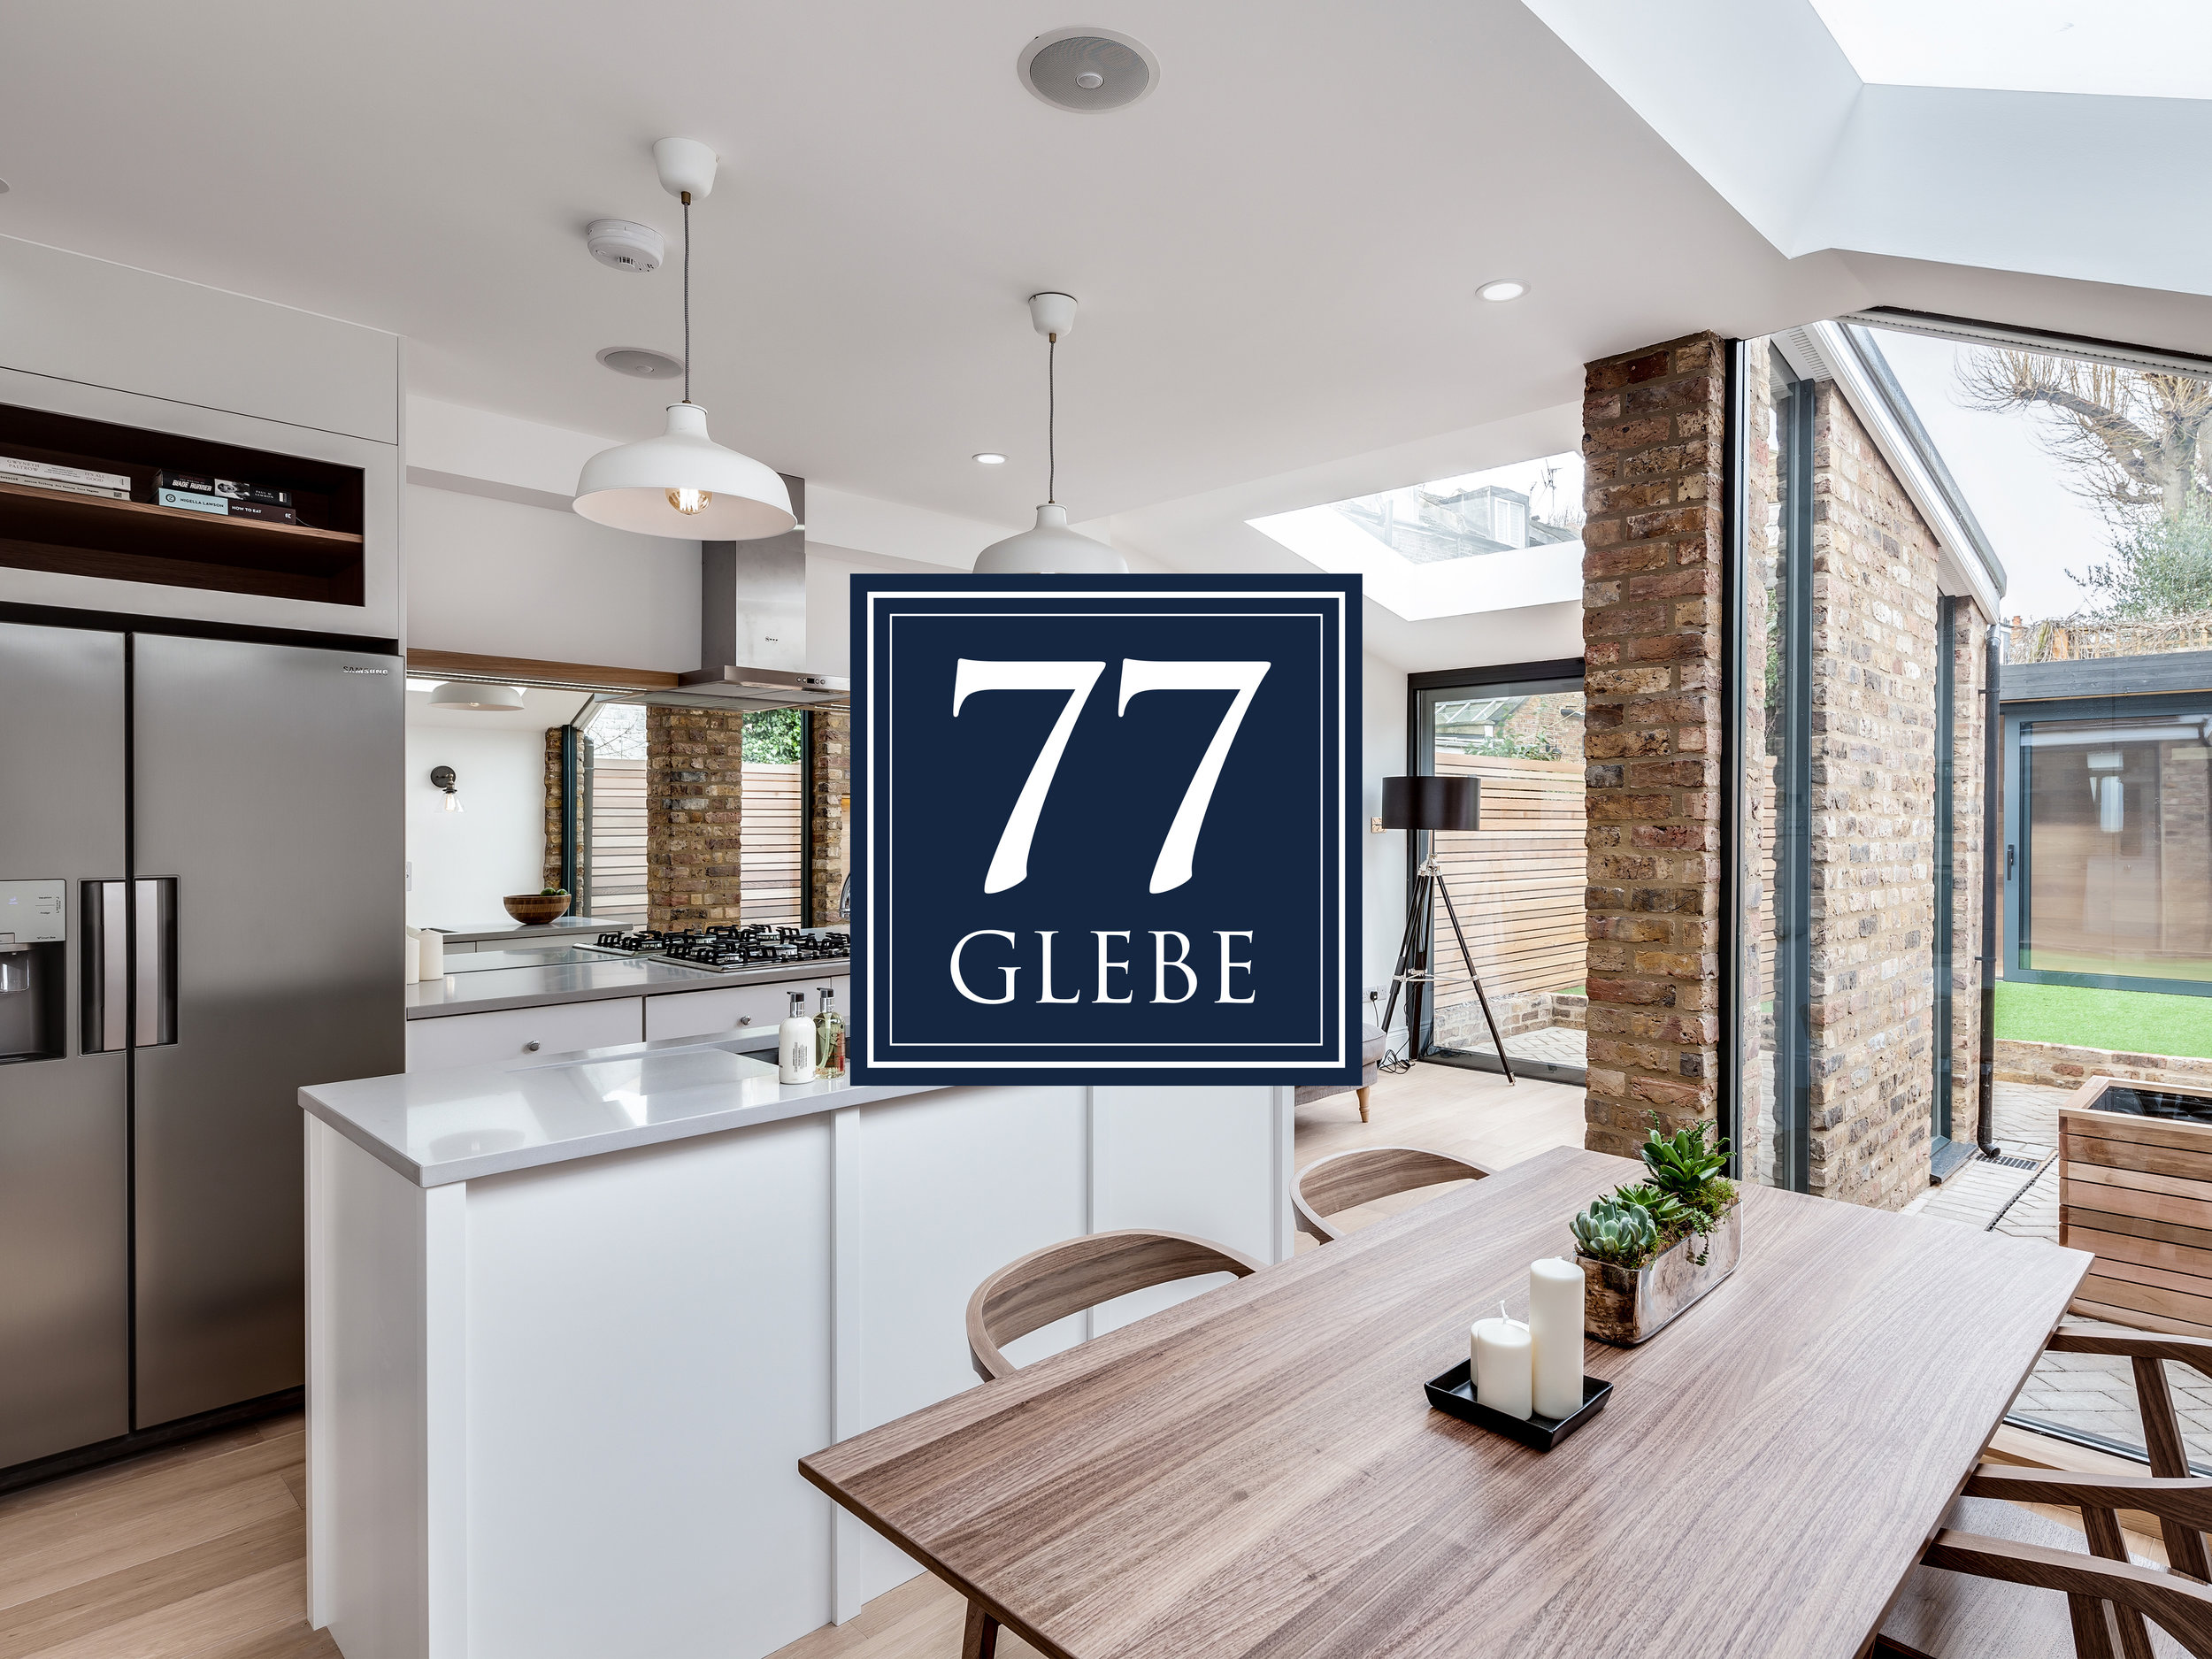 77 Glebe Street - Identity DesignPhotographyBook Design & PrintWebsite Design